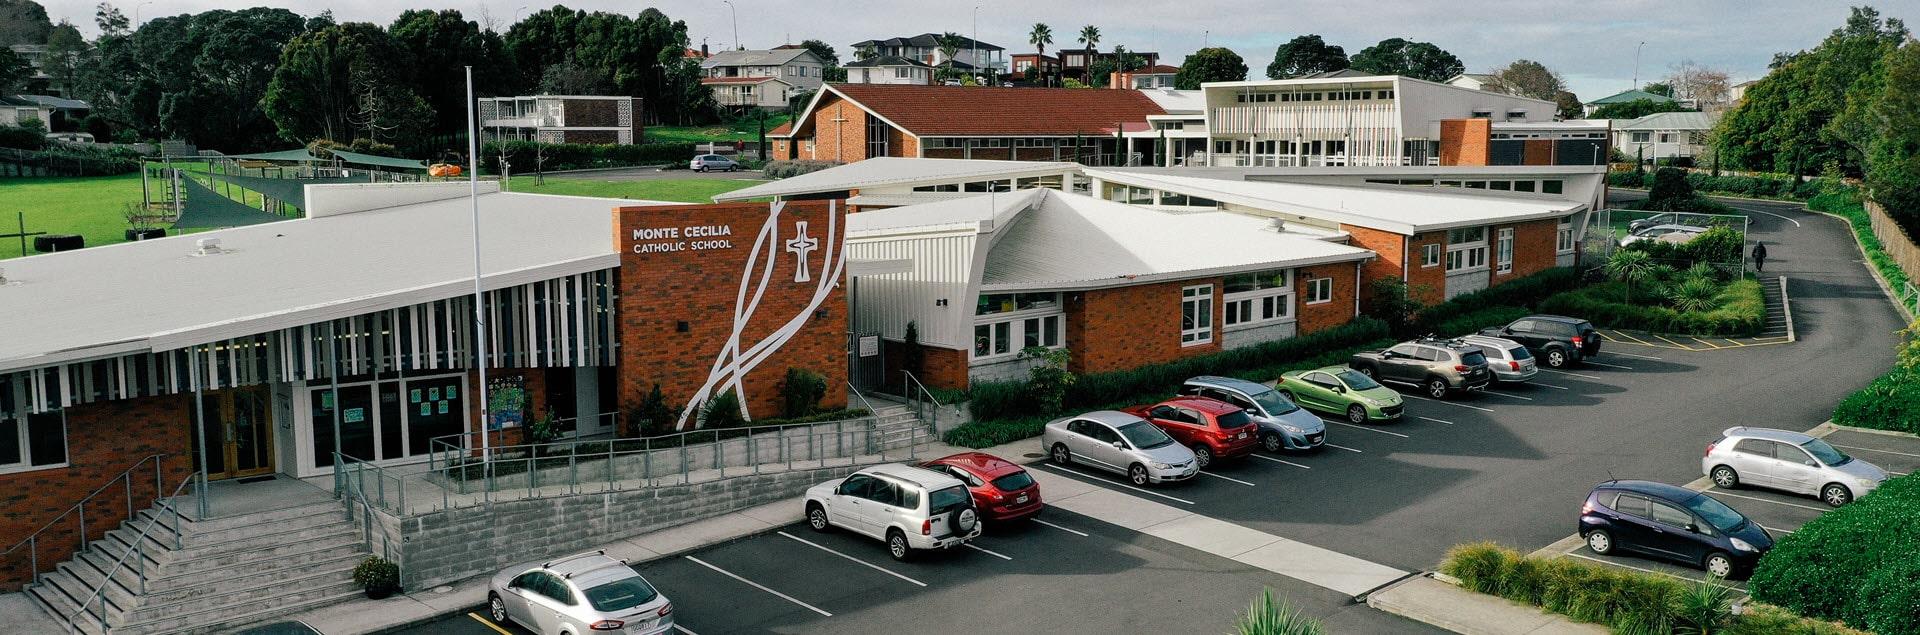 Monte Cecilia Catholic School